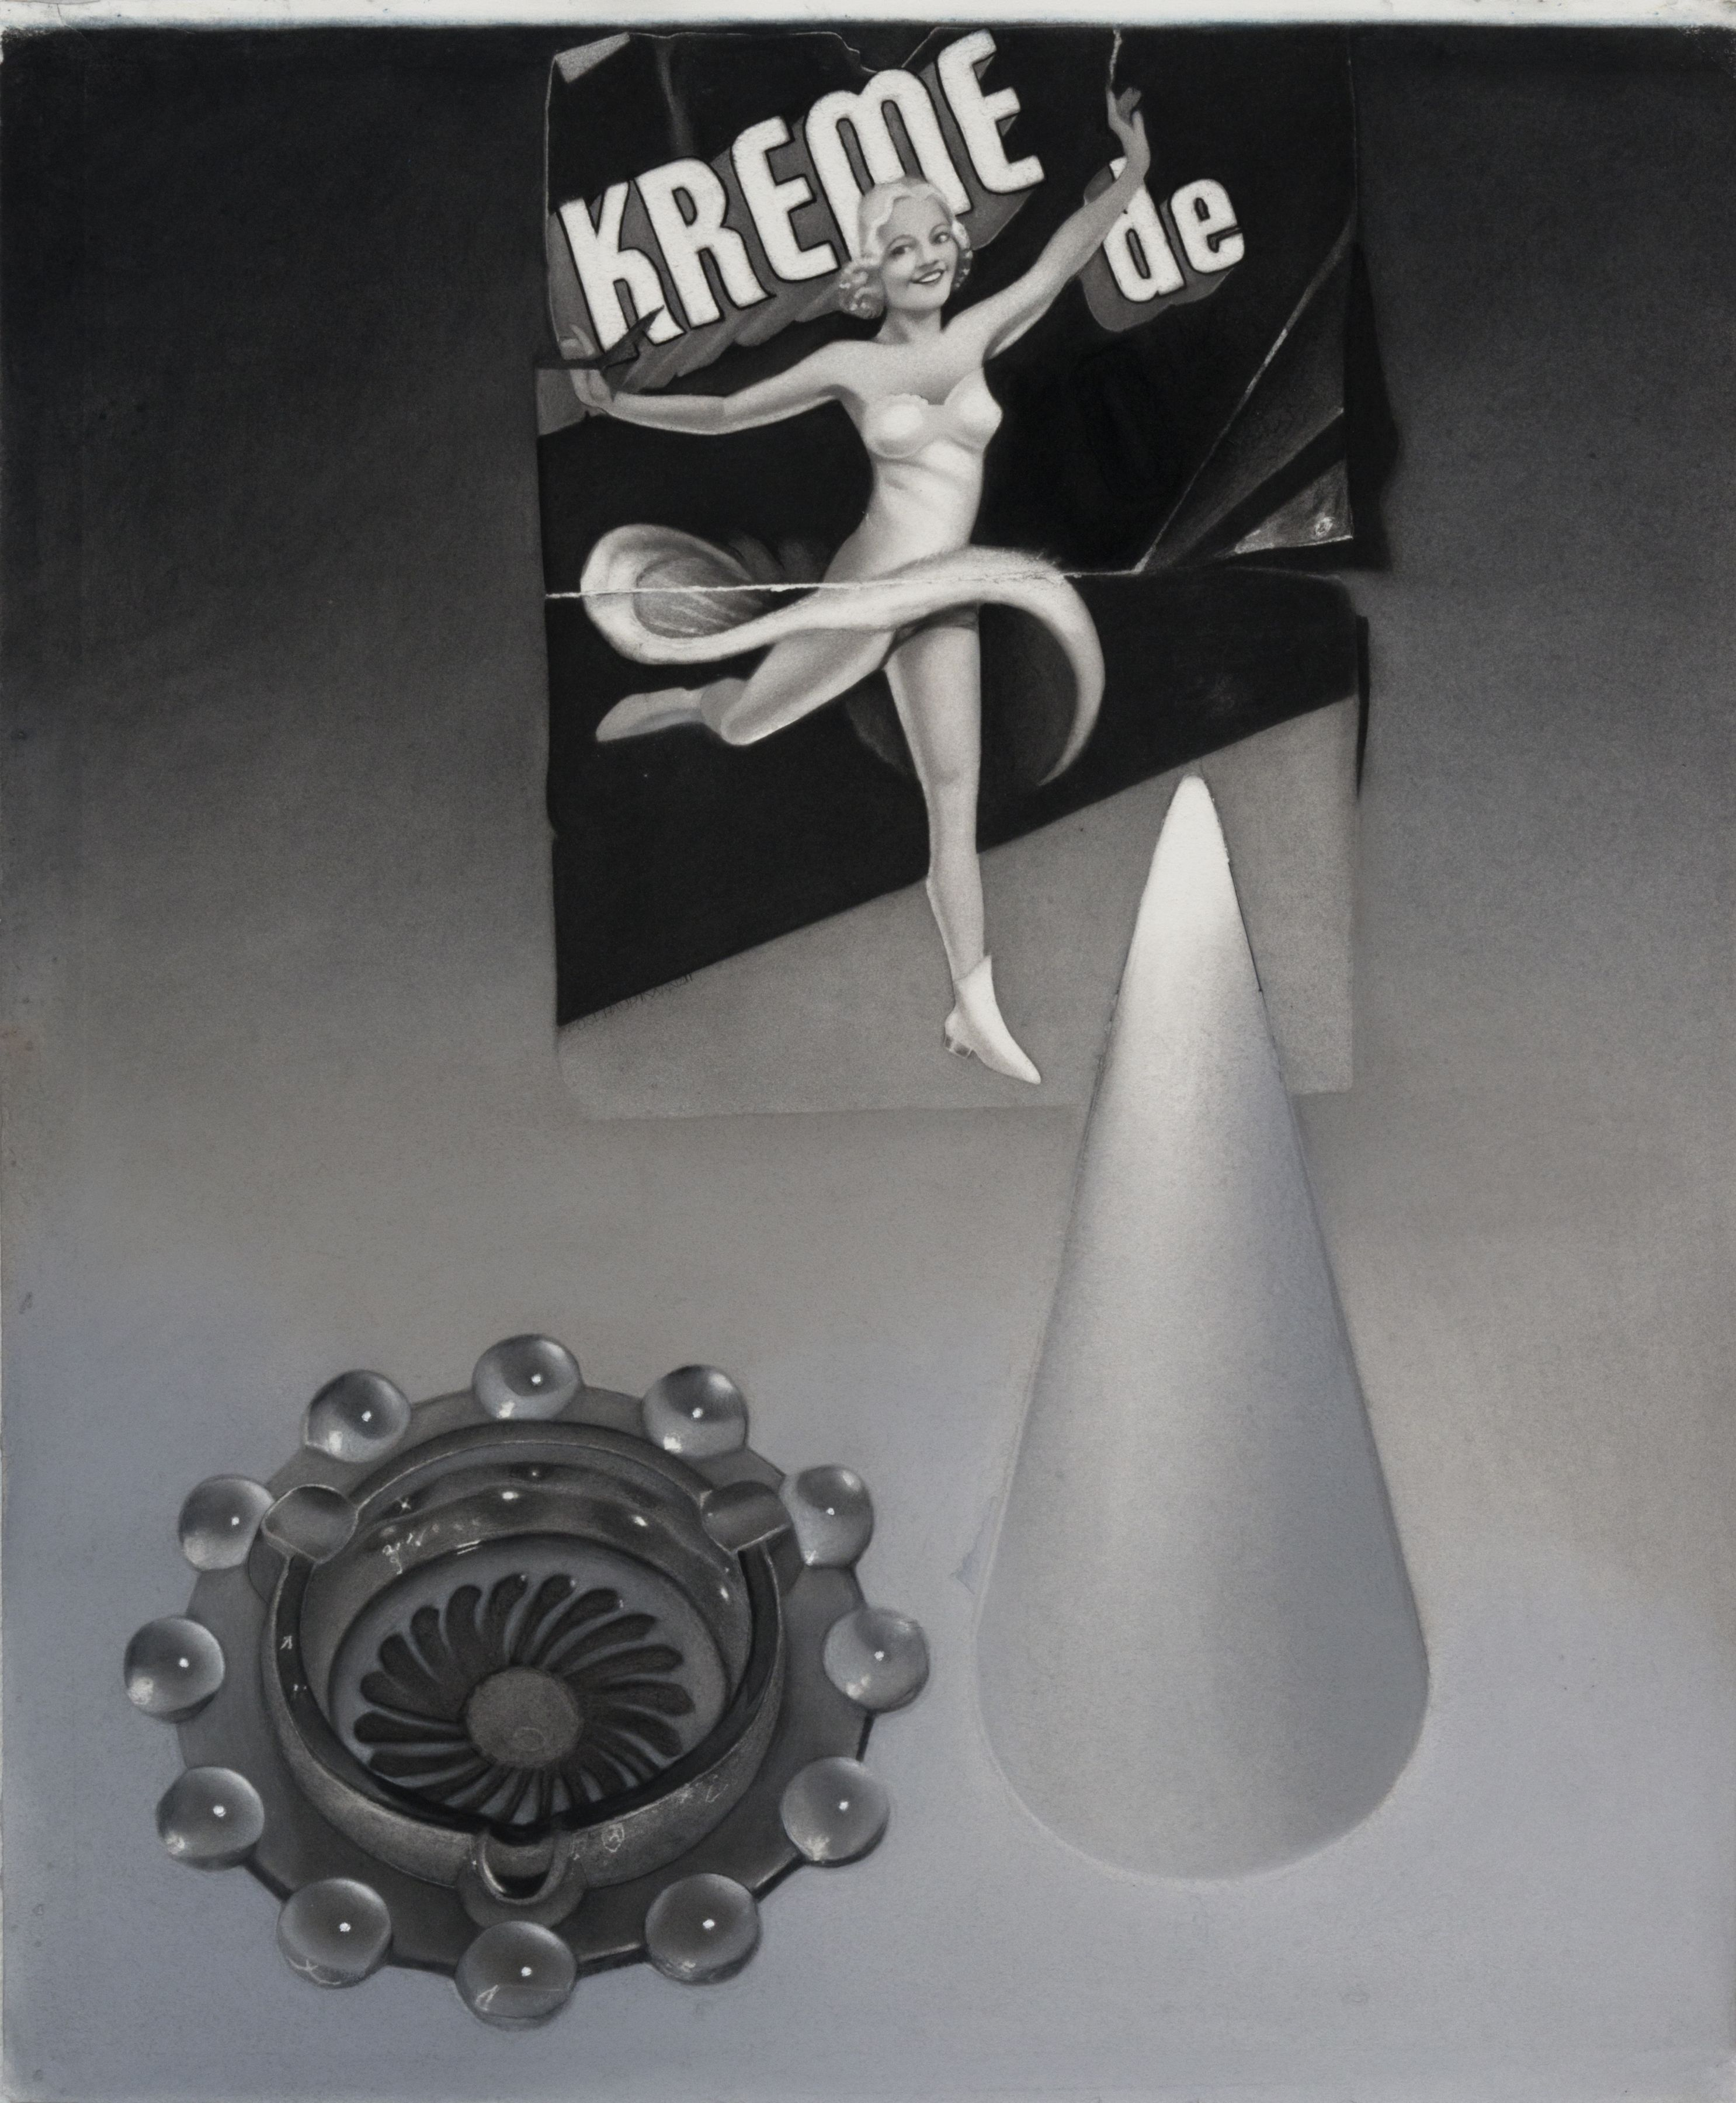 susan hauptman, Still Life (Kreme de), 2011, charcoal on paper, 32 x 38 1/2 inches